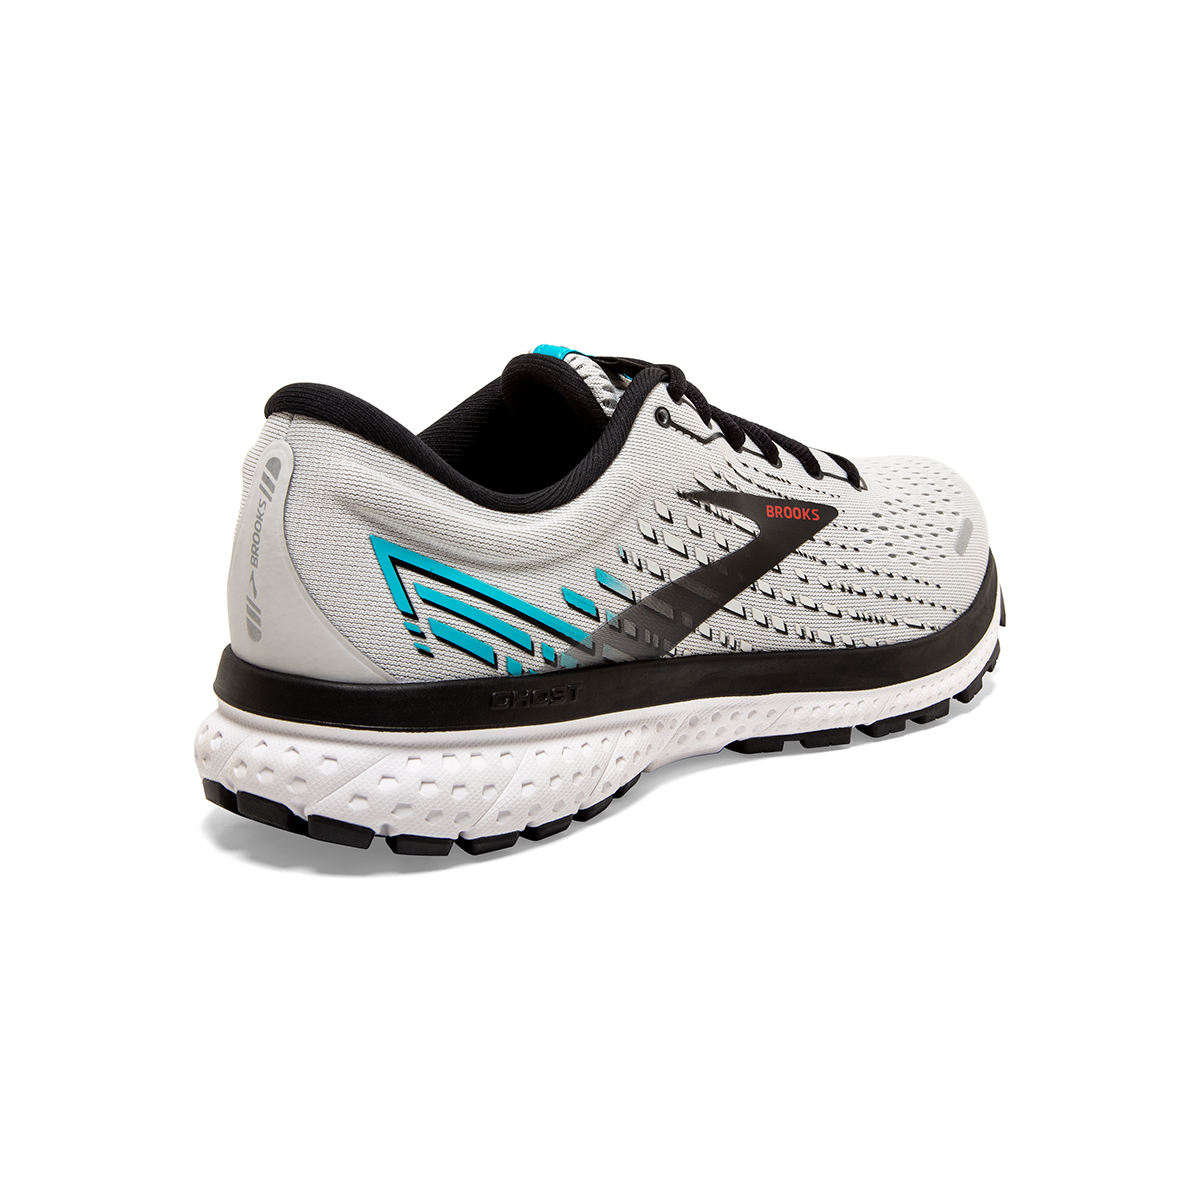 Men's Brooks Ghost 13 Running Shoe, , large, image 6